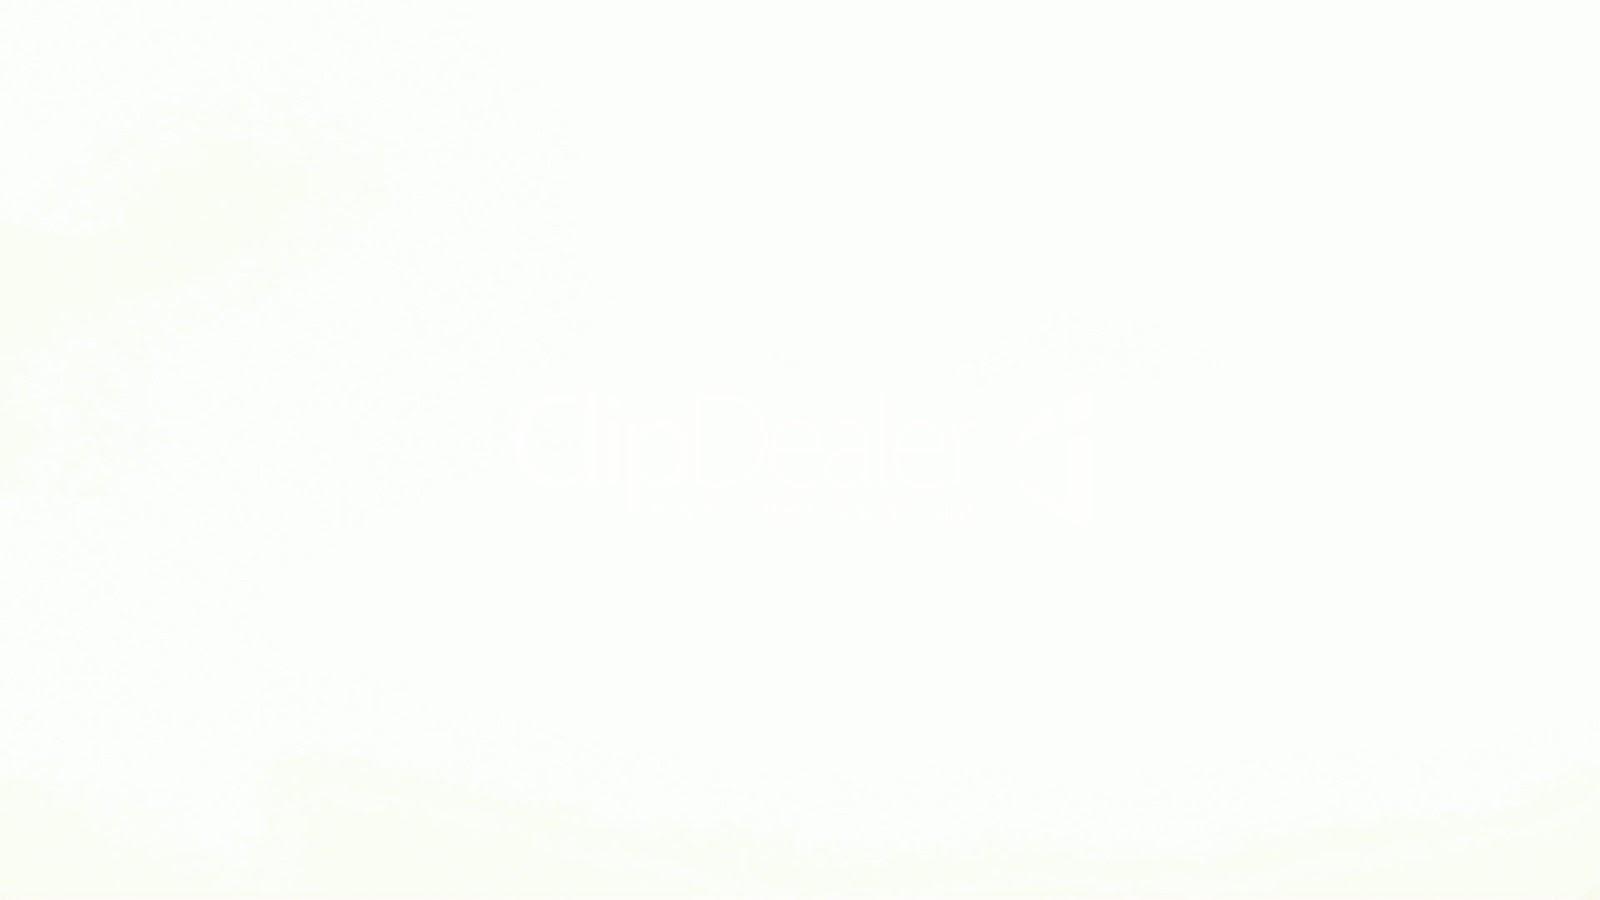 Ecran Iphone  Blanc